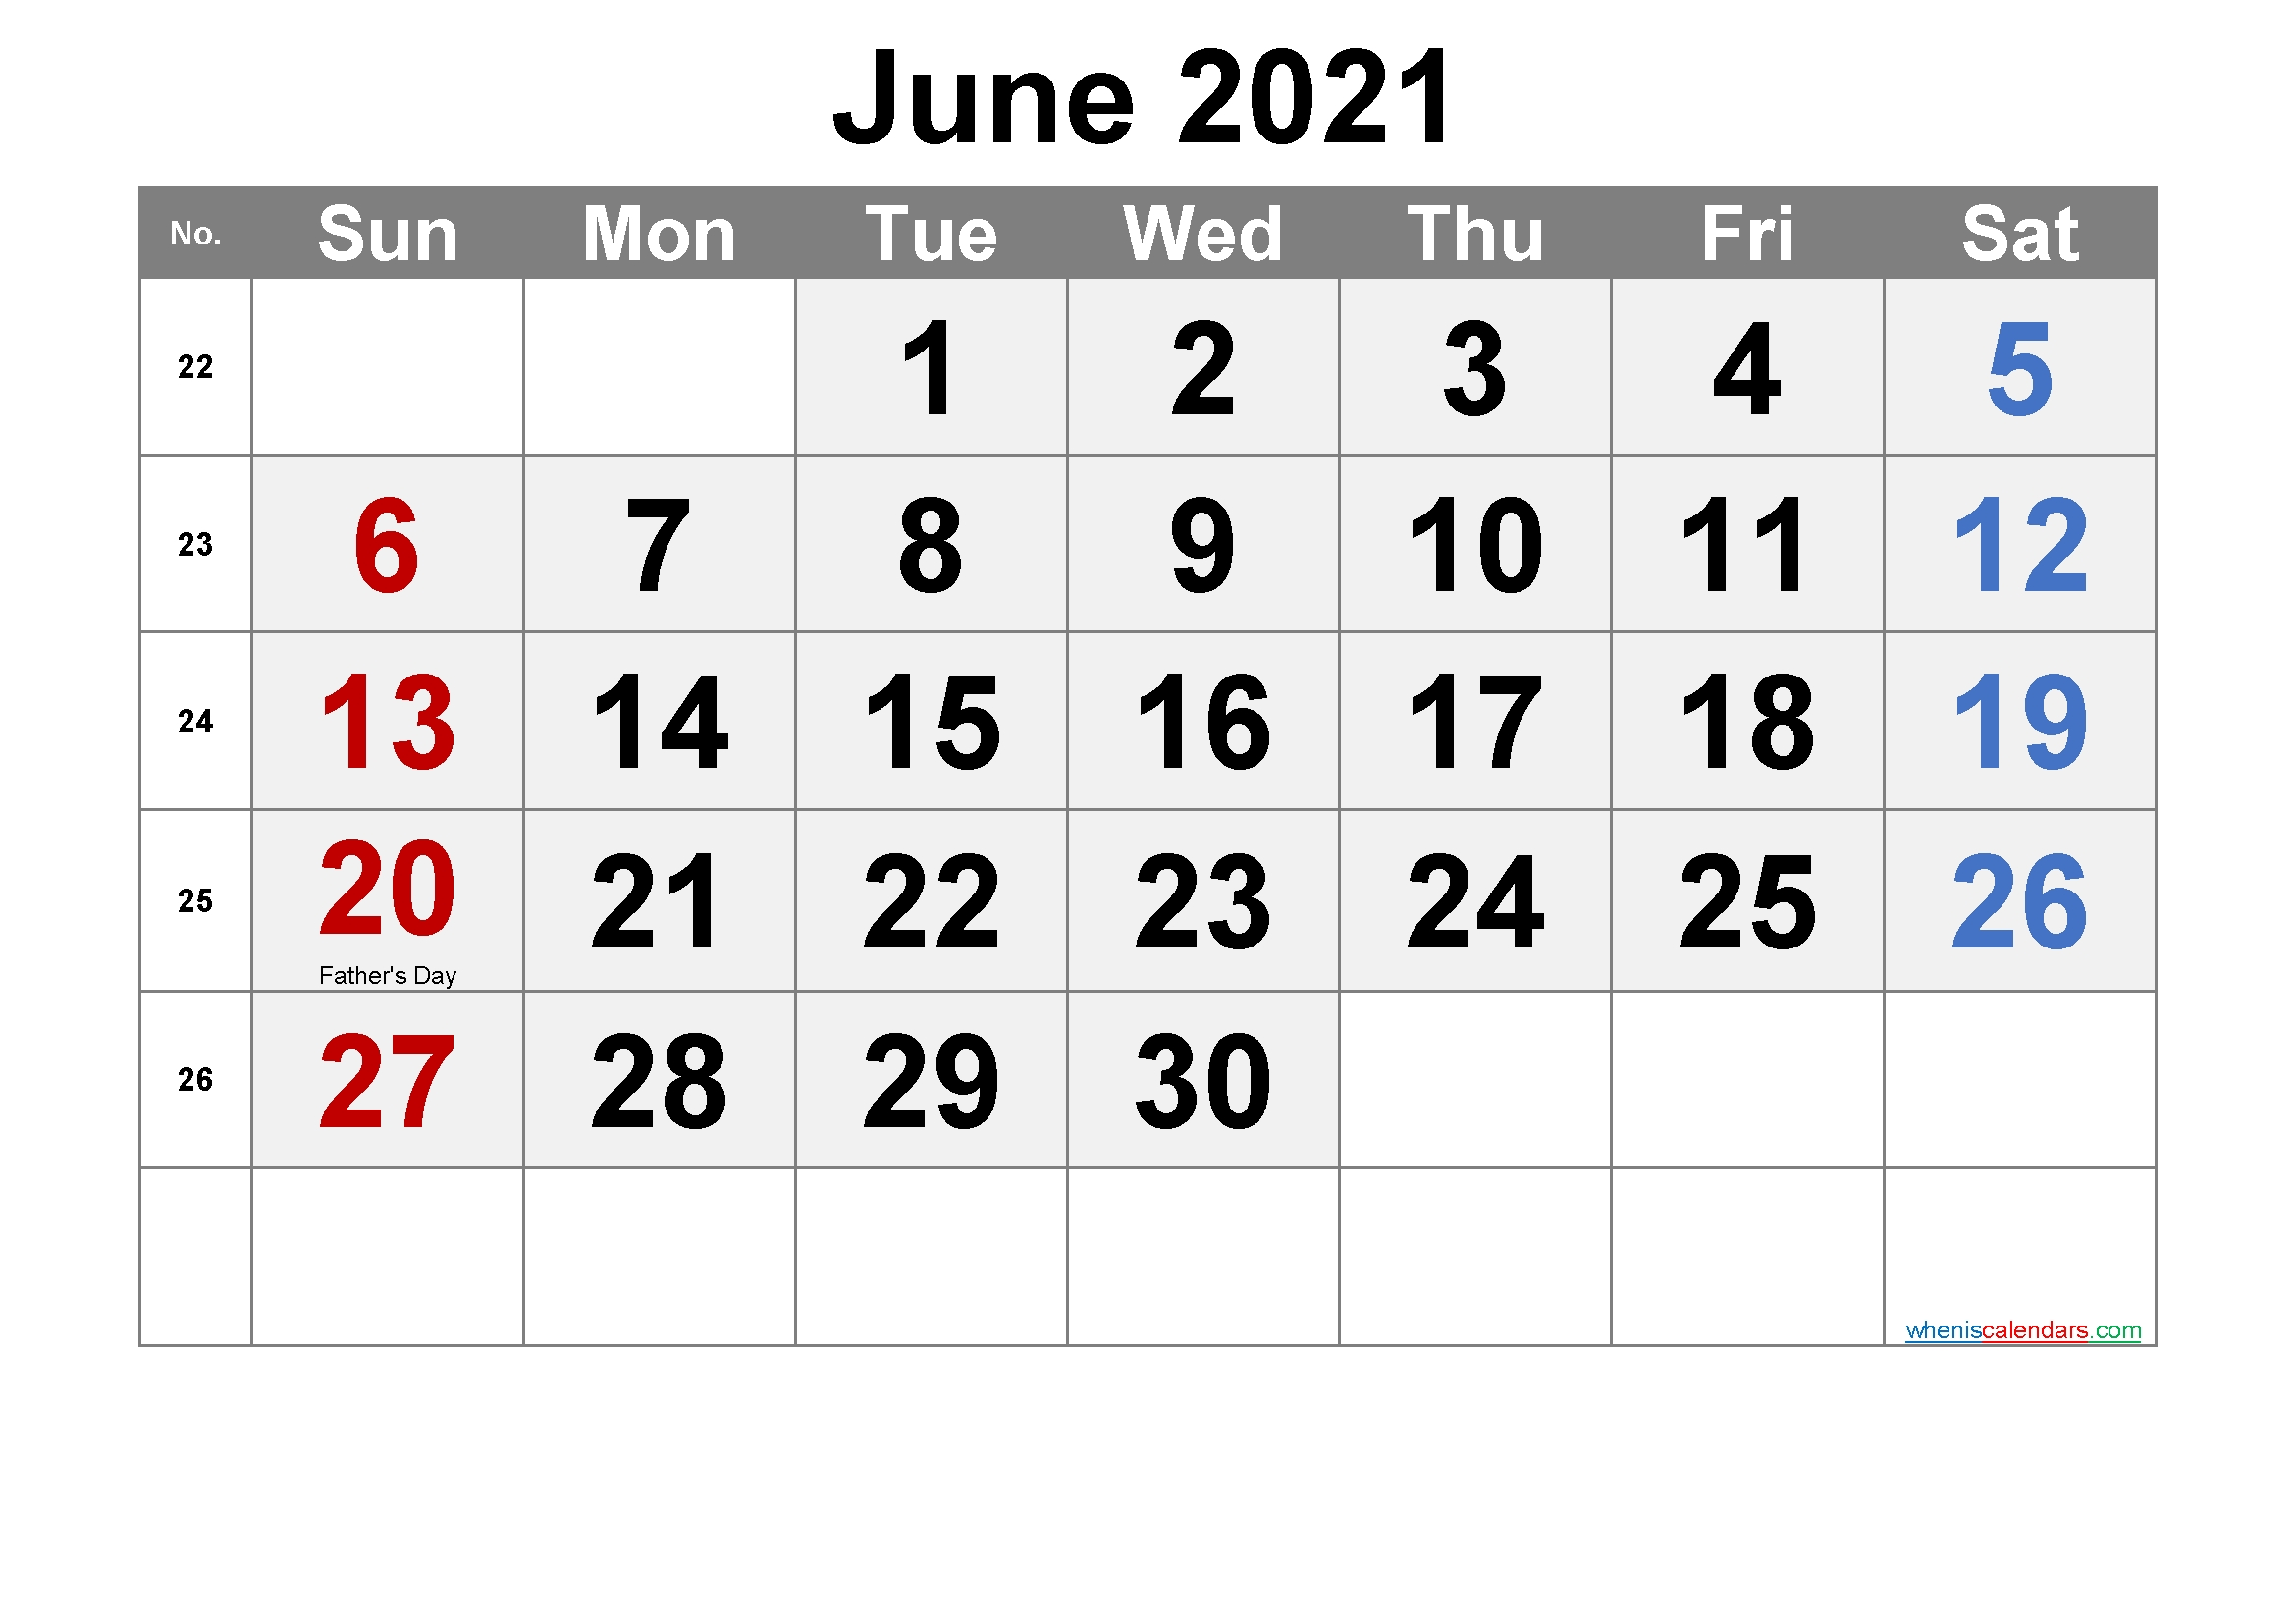 Free June 2021 Calendar Printable June 2021 Calendar With Holidays Printable